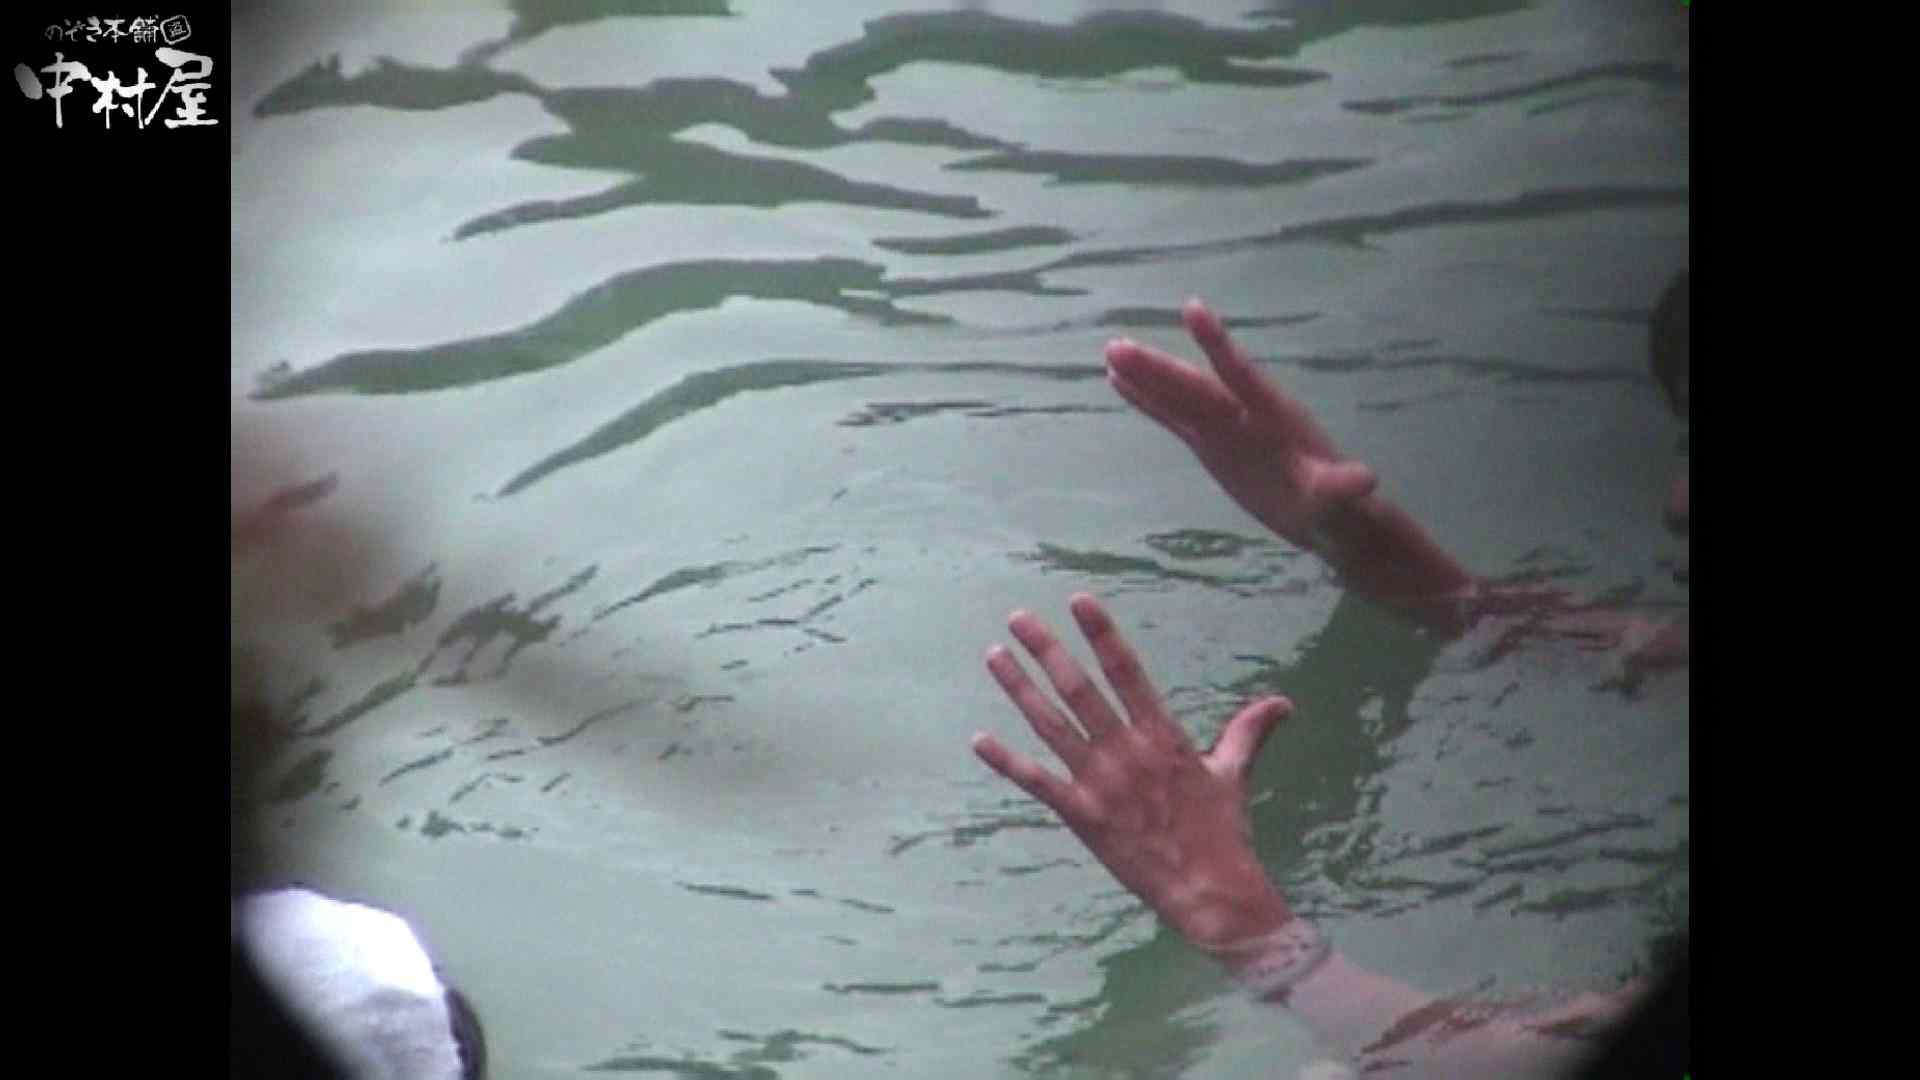 Aquaな露天風呂Vol.952 OLのエロ生活 おまんこ動画流出 106連発 17